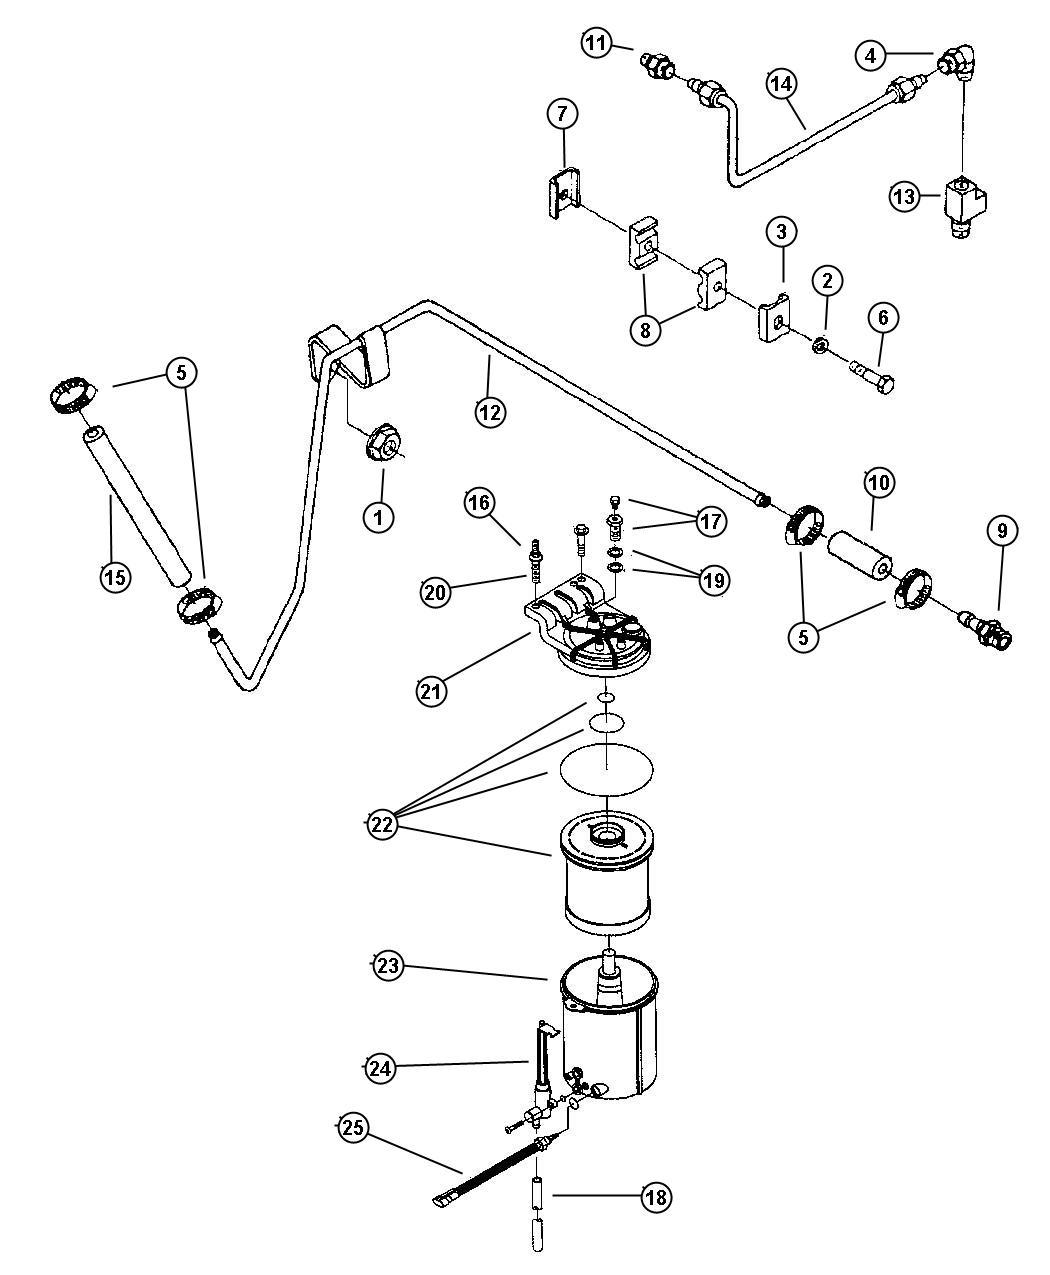 dodge ram 2500 fuel filter diagram